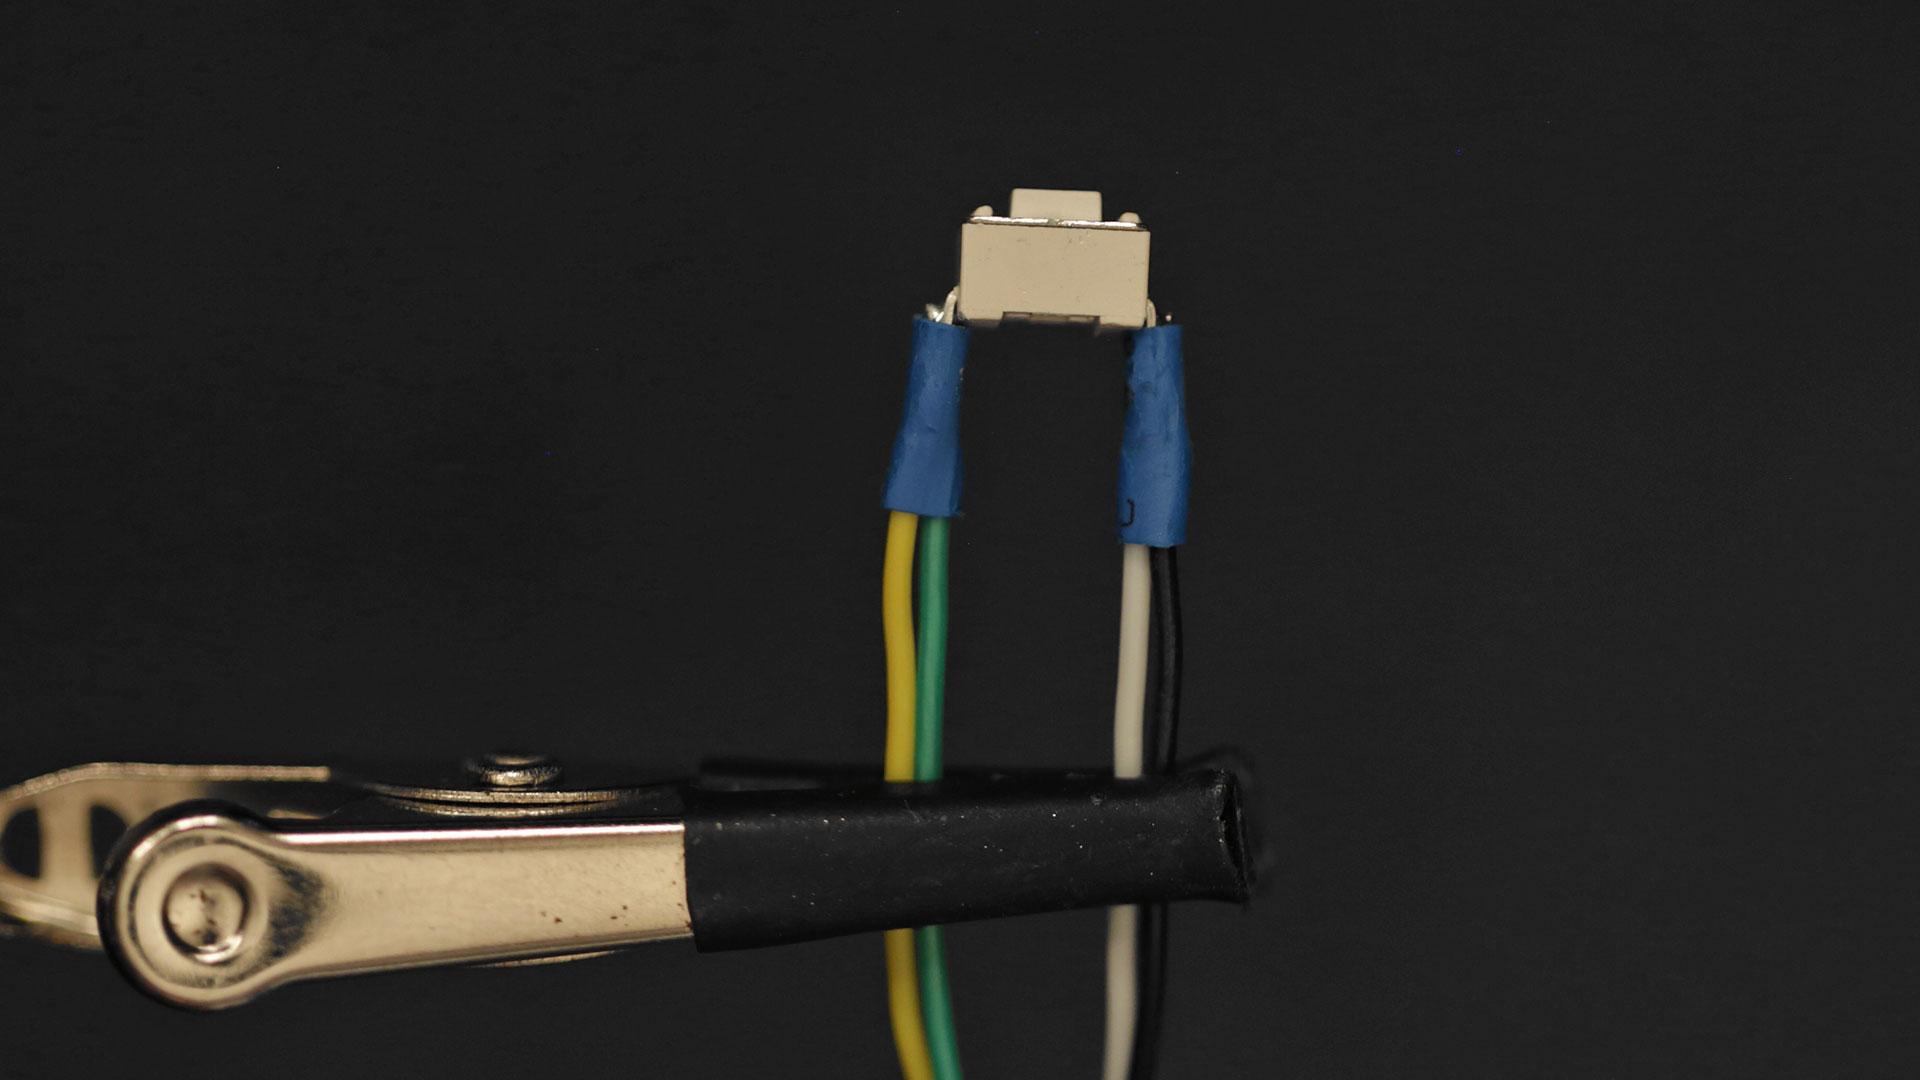 3d_printing_trigger-btn-heat-tube.jpg